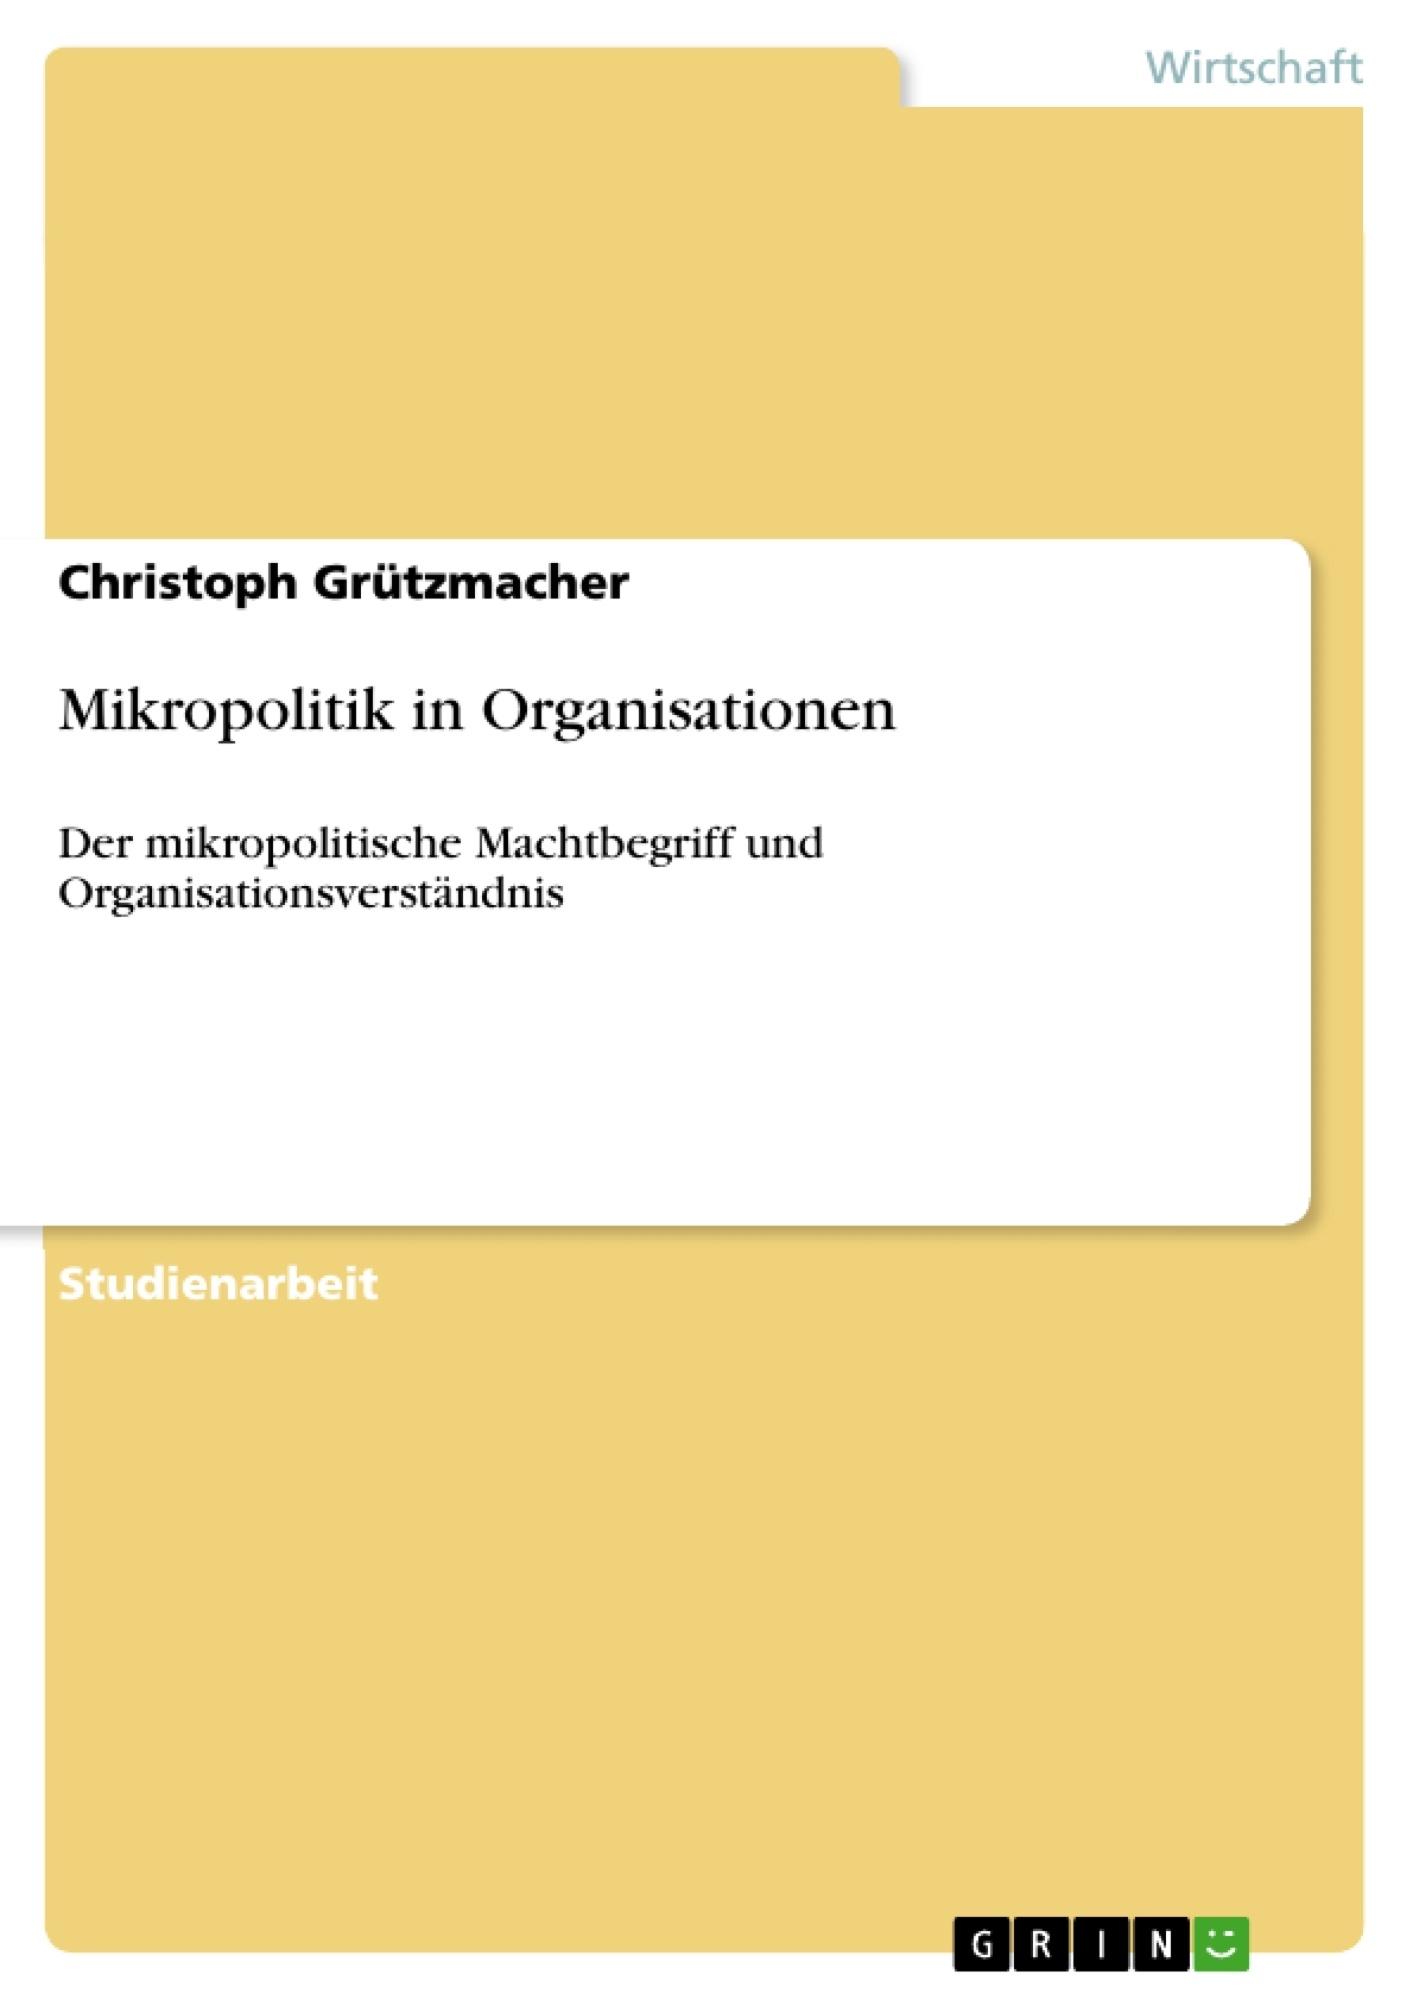 Titel: Mikropolitik in Organisationen